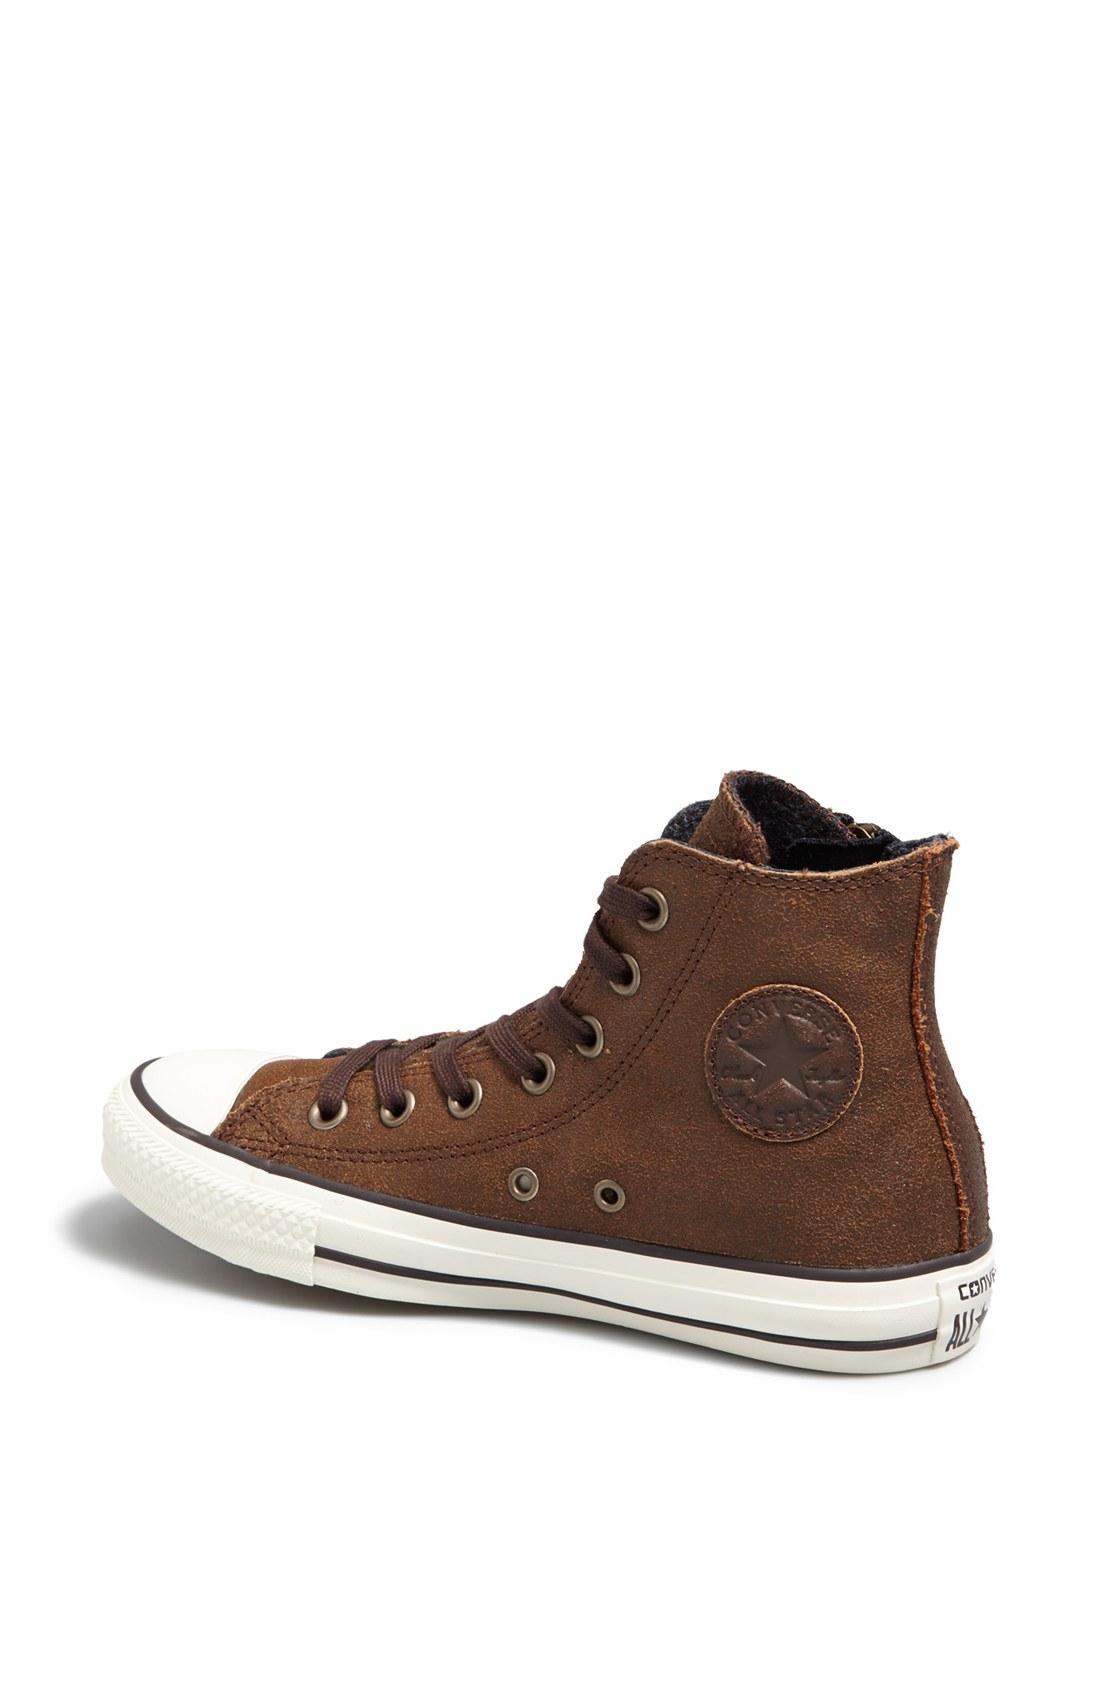 Womens Converse Leather Shoes Australia